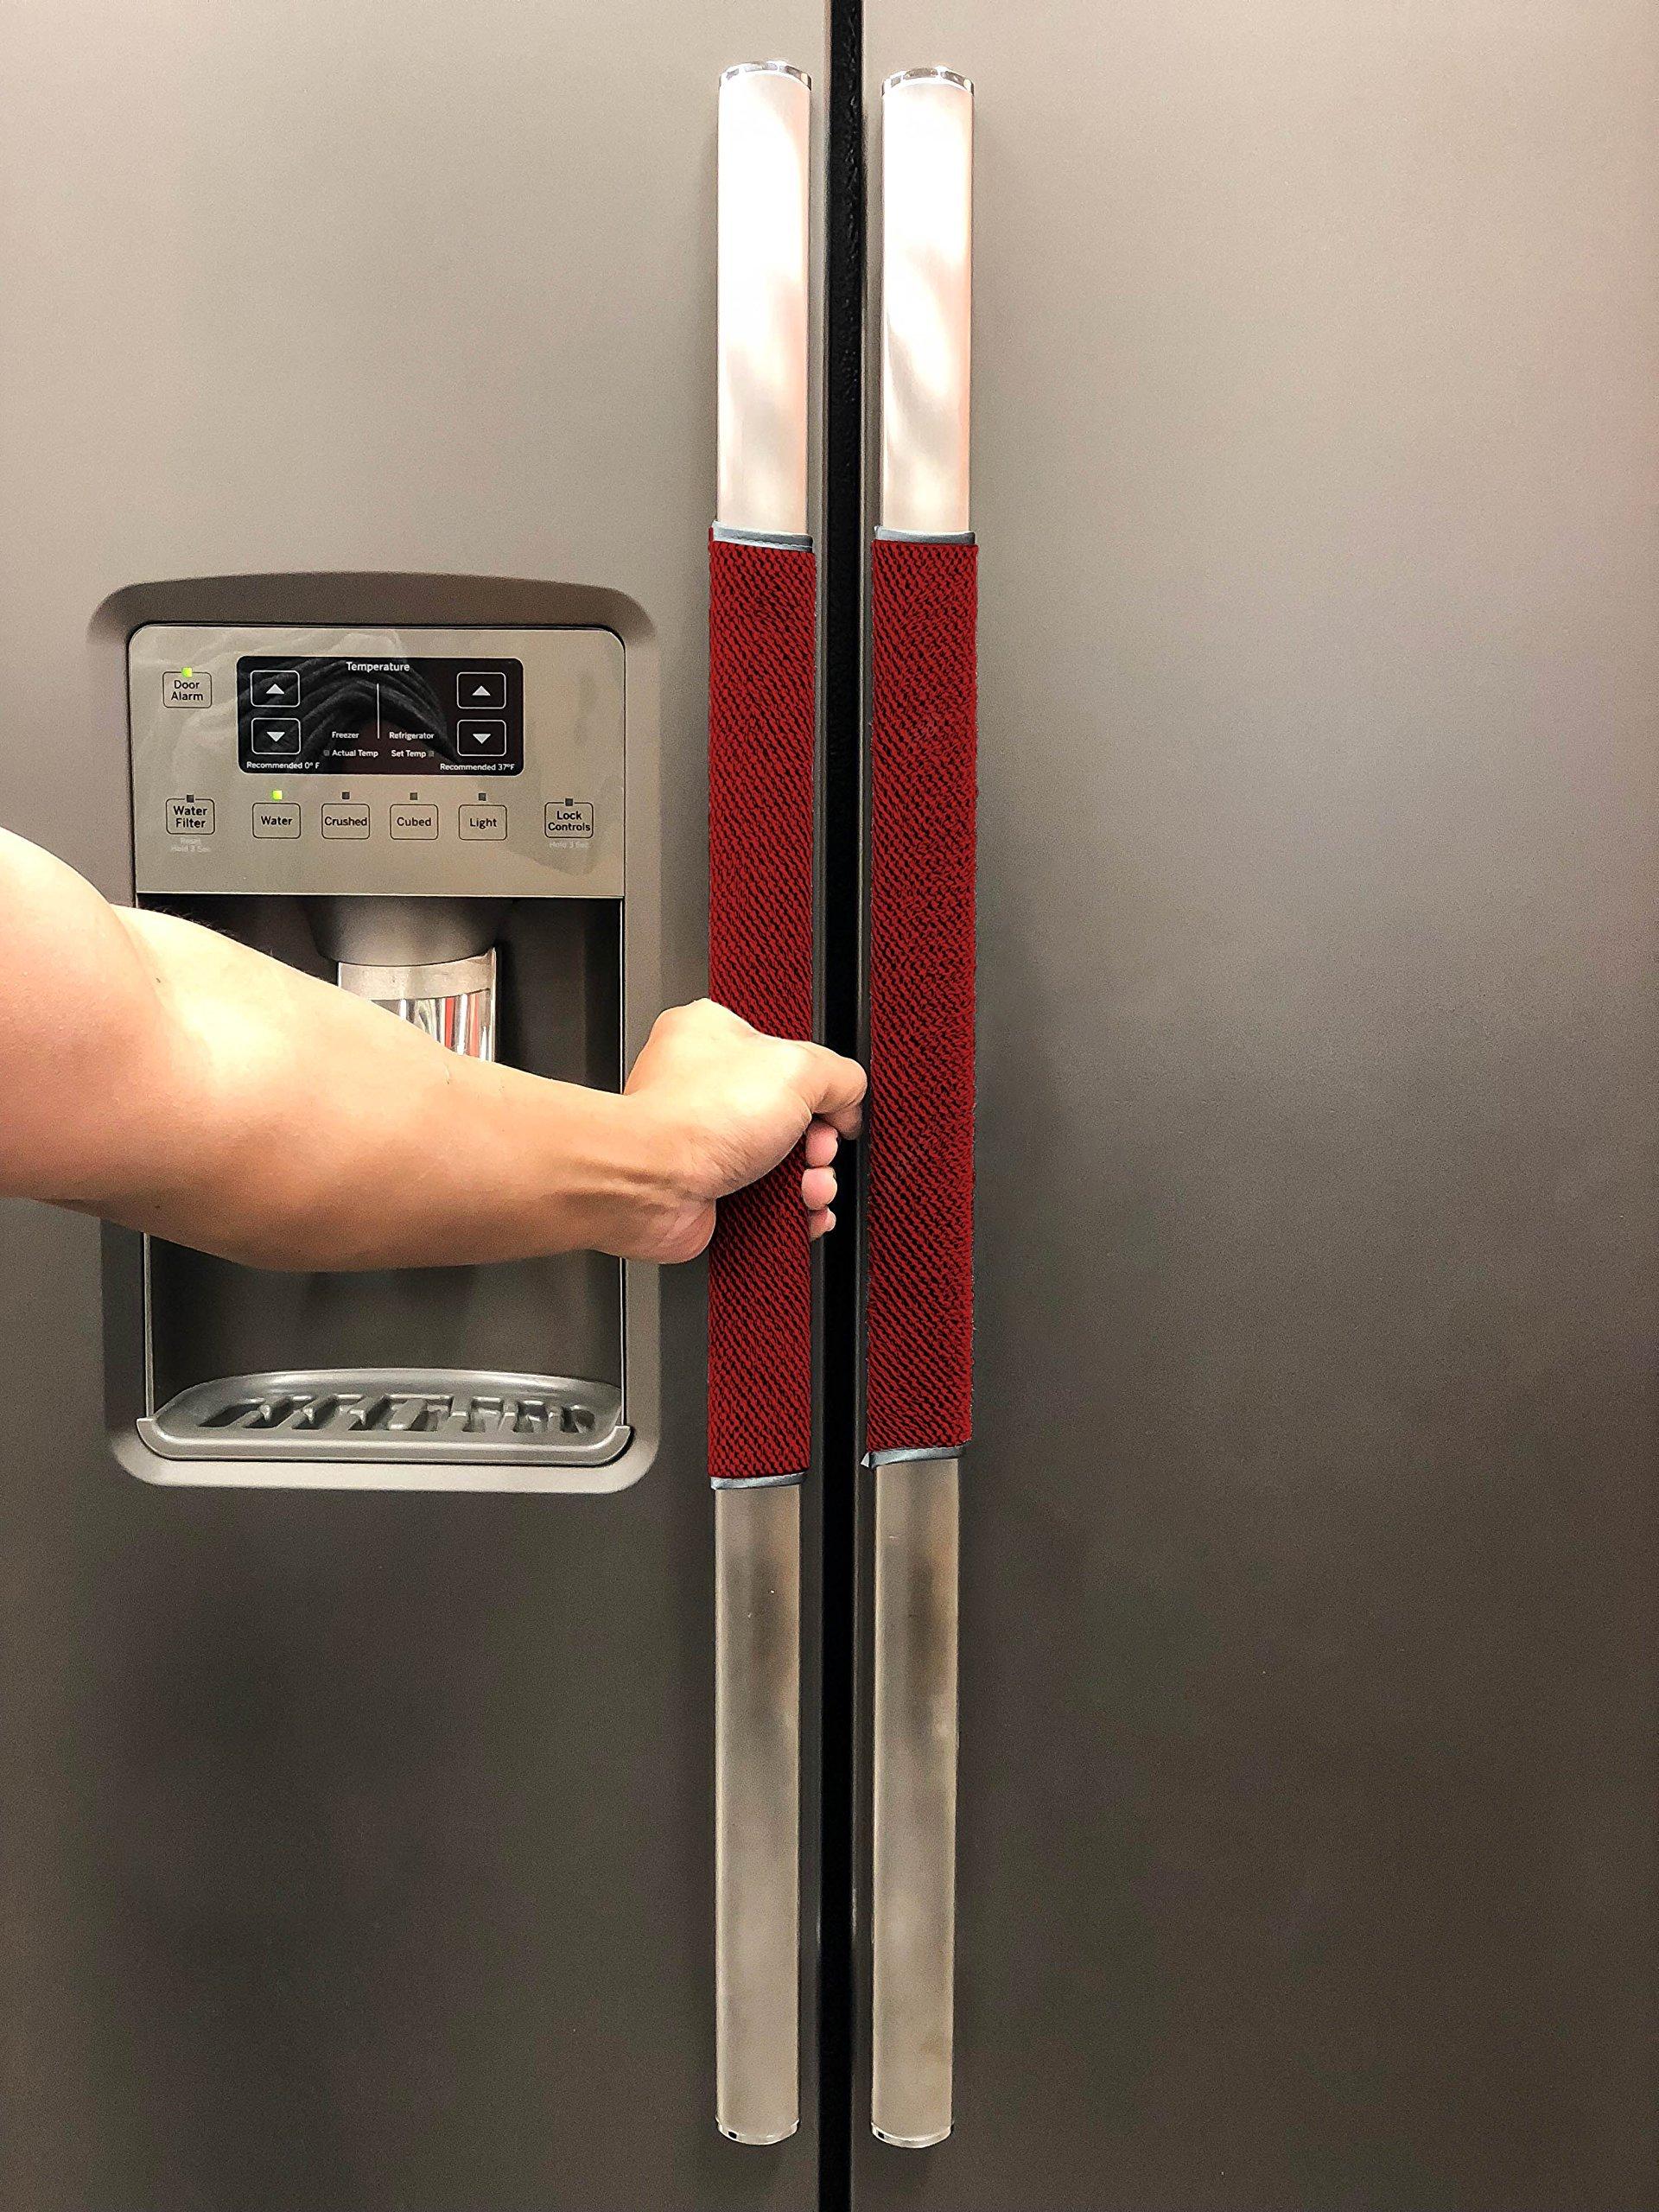 FarmCrafts (4 PIECE SET) 100% ORGANIC COTTON Refrigerator door handle covers for 4 inch handles kitchen Appliances Fridge Microwave Oven Dishwasher - Smudges & Fingerprints(Burgundy/Maroon)